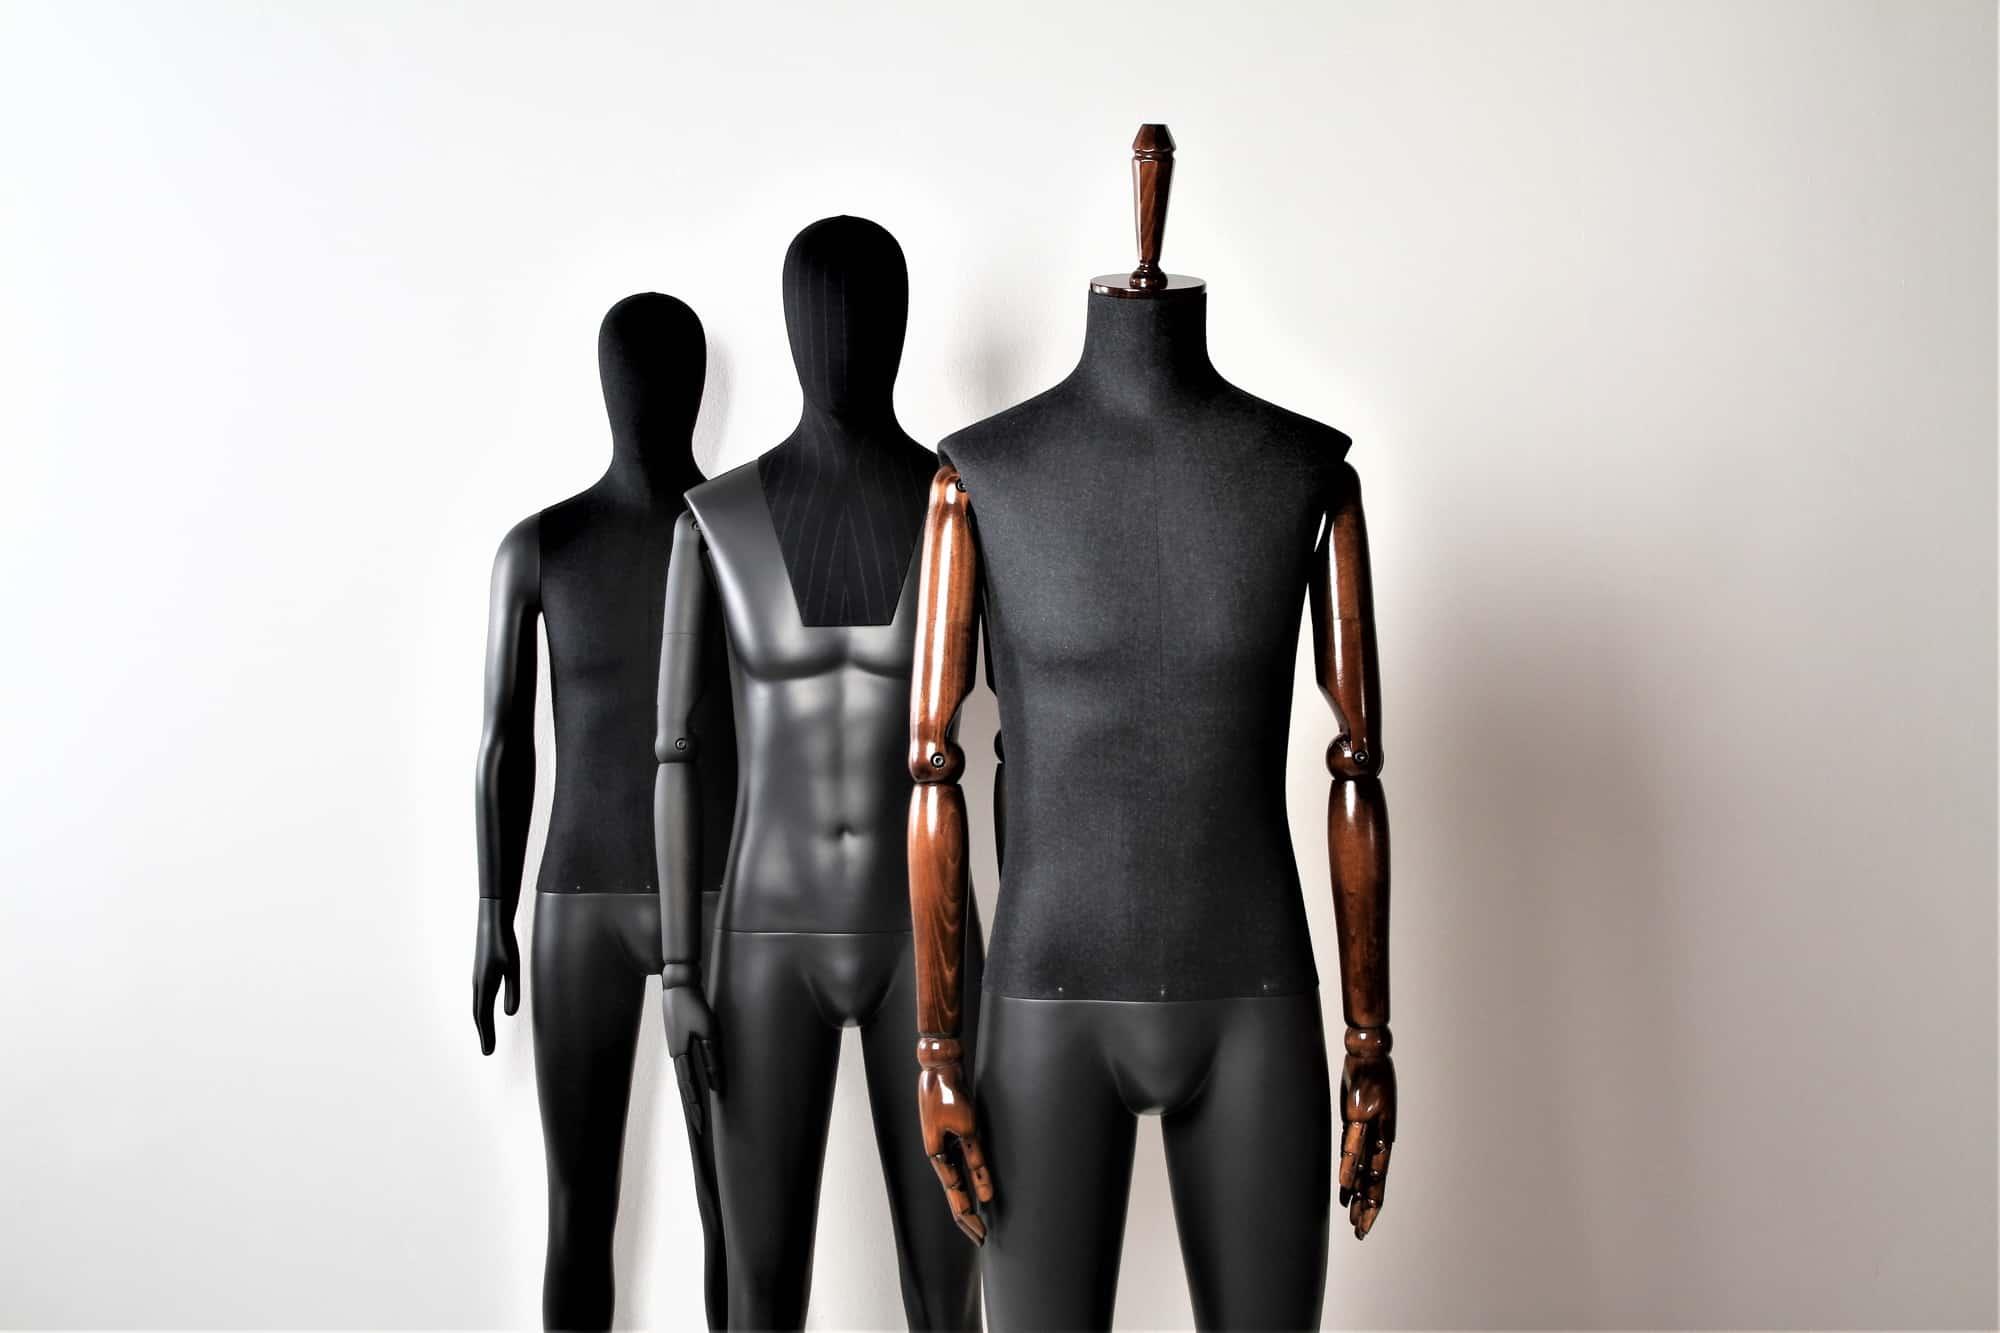 bonaveri bust forms mannequins sartorial 08